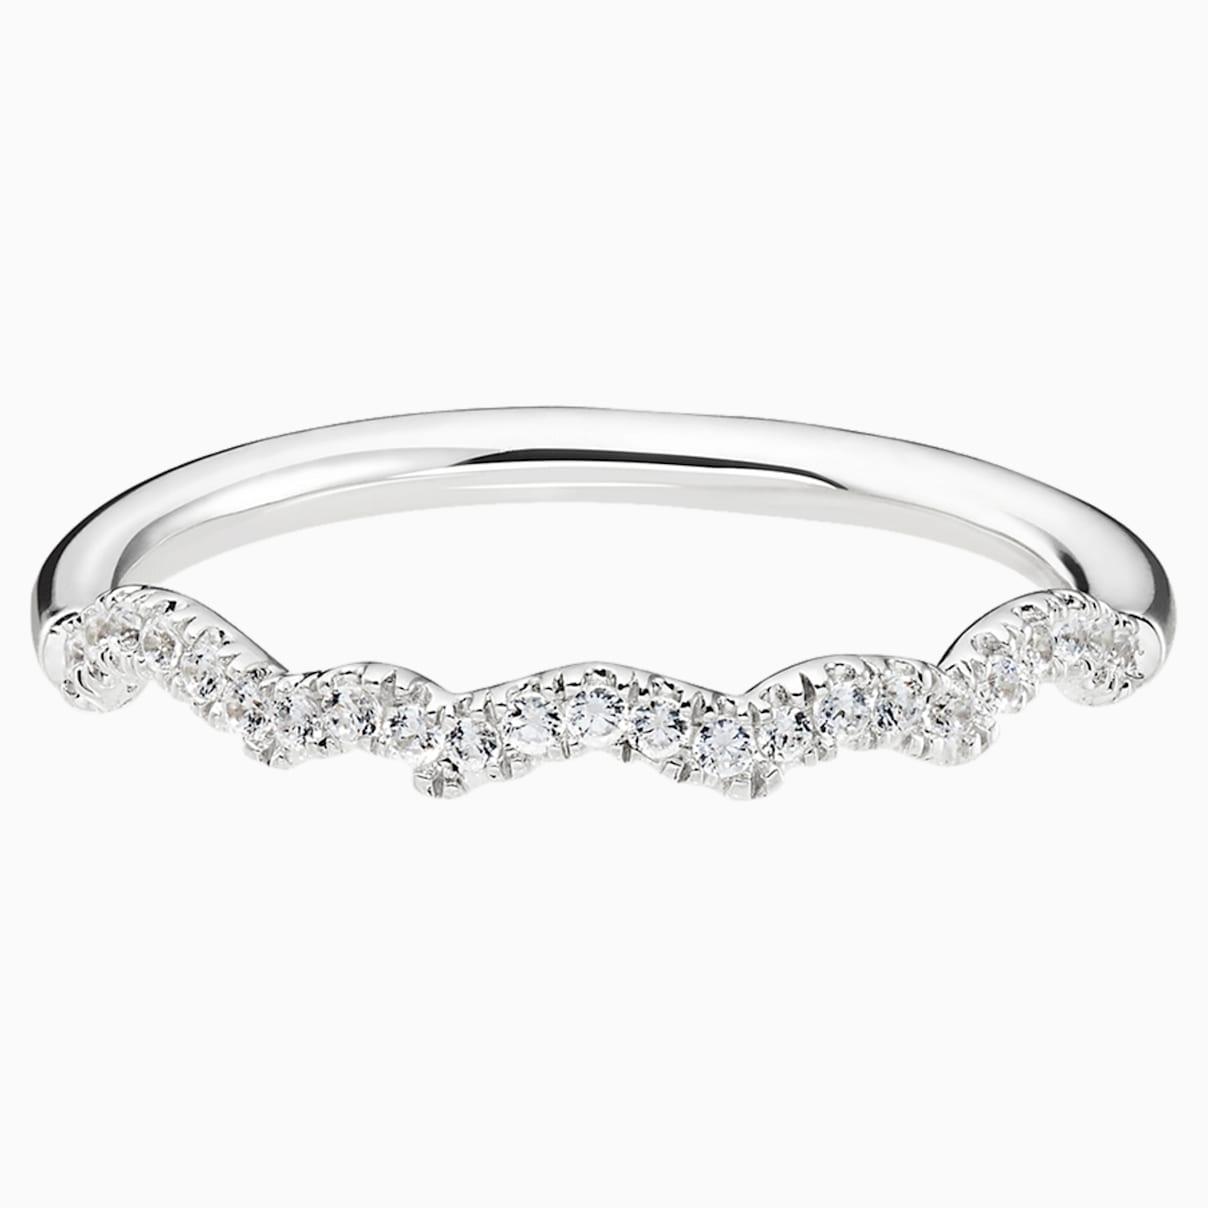 Knot of True Love Slim Band Ring, Swarovski Created Diamonds, 18K White Gold, Size 58